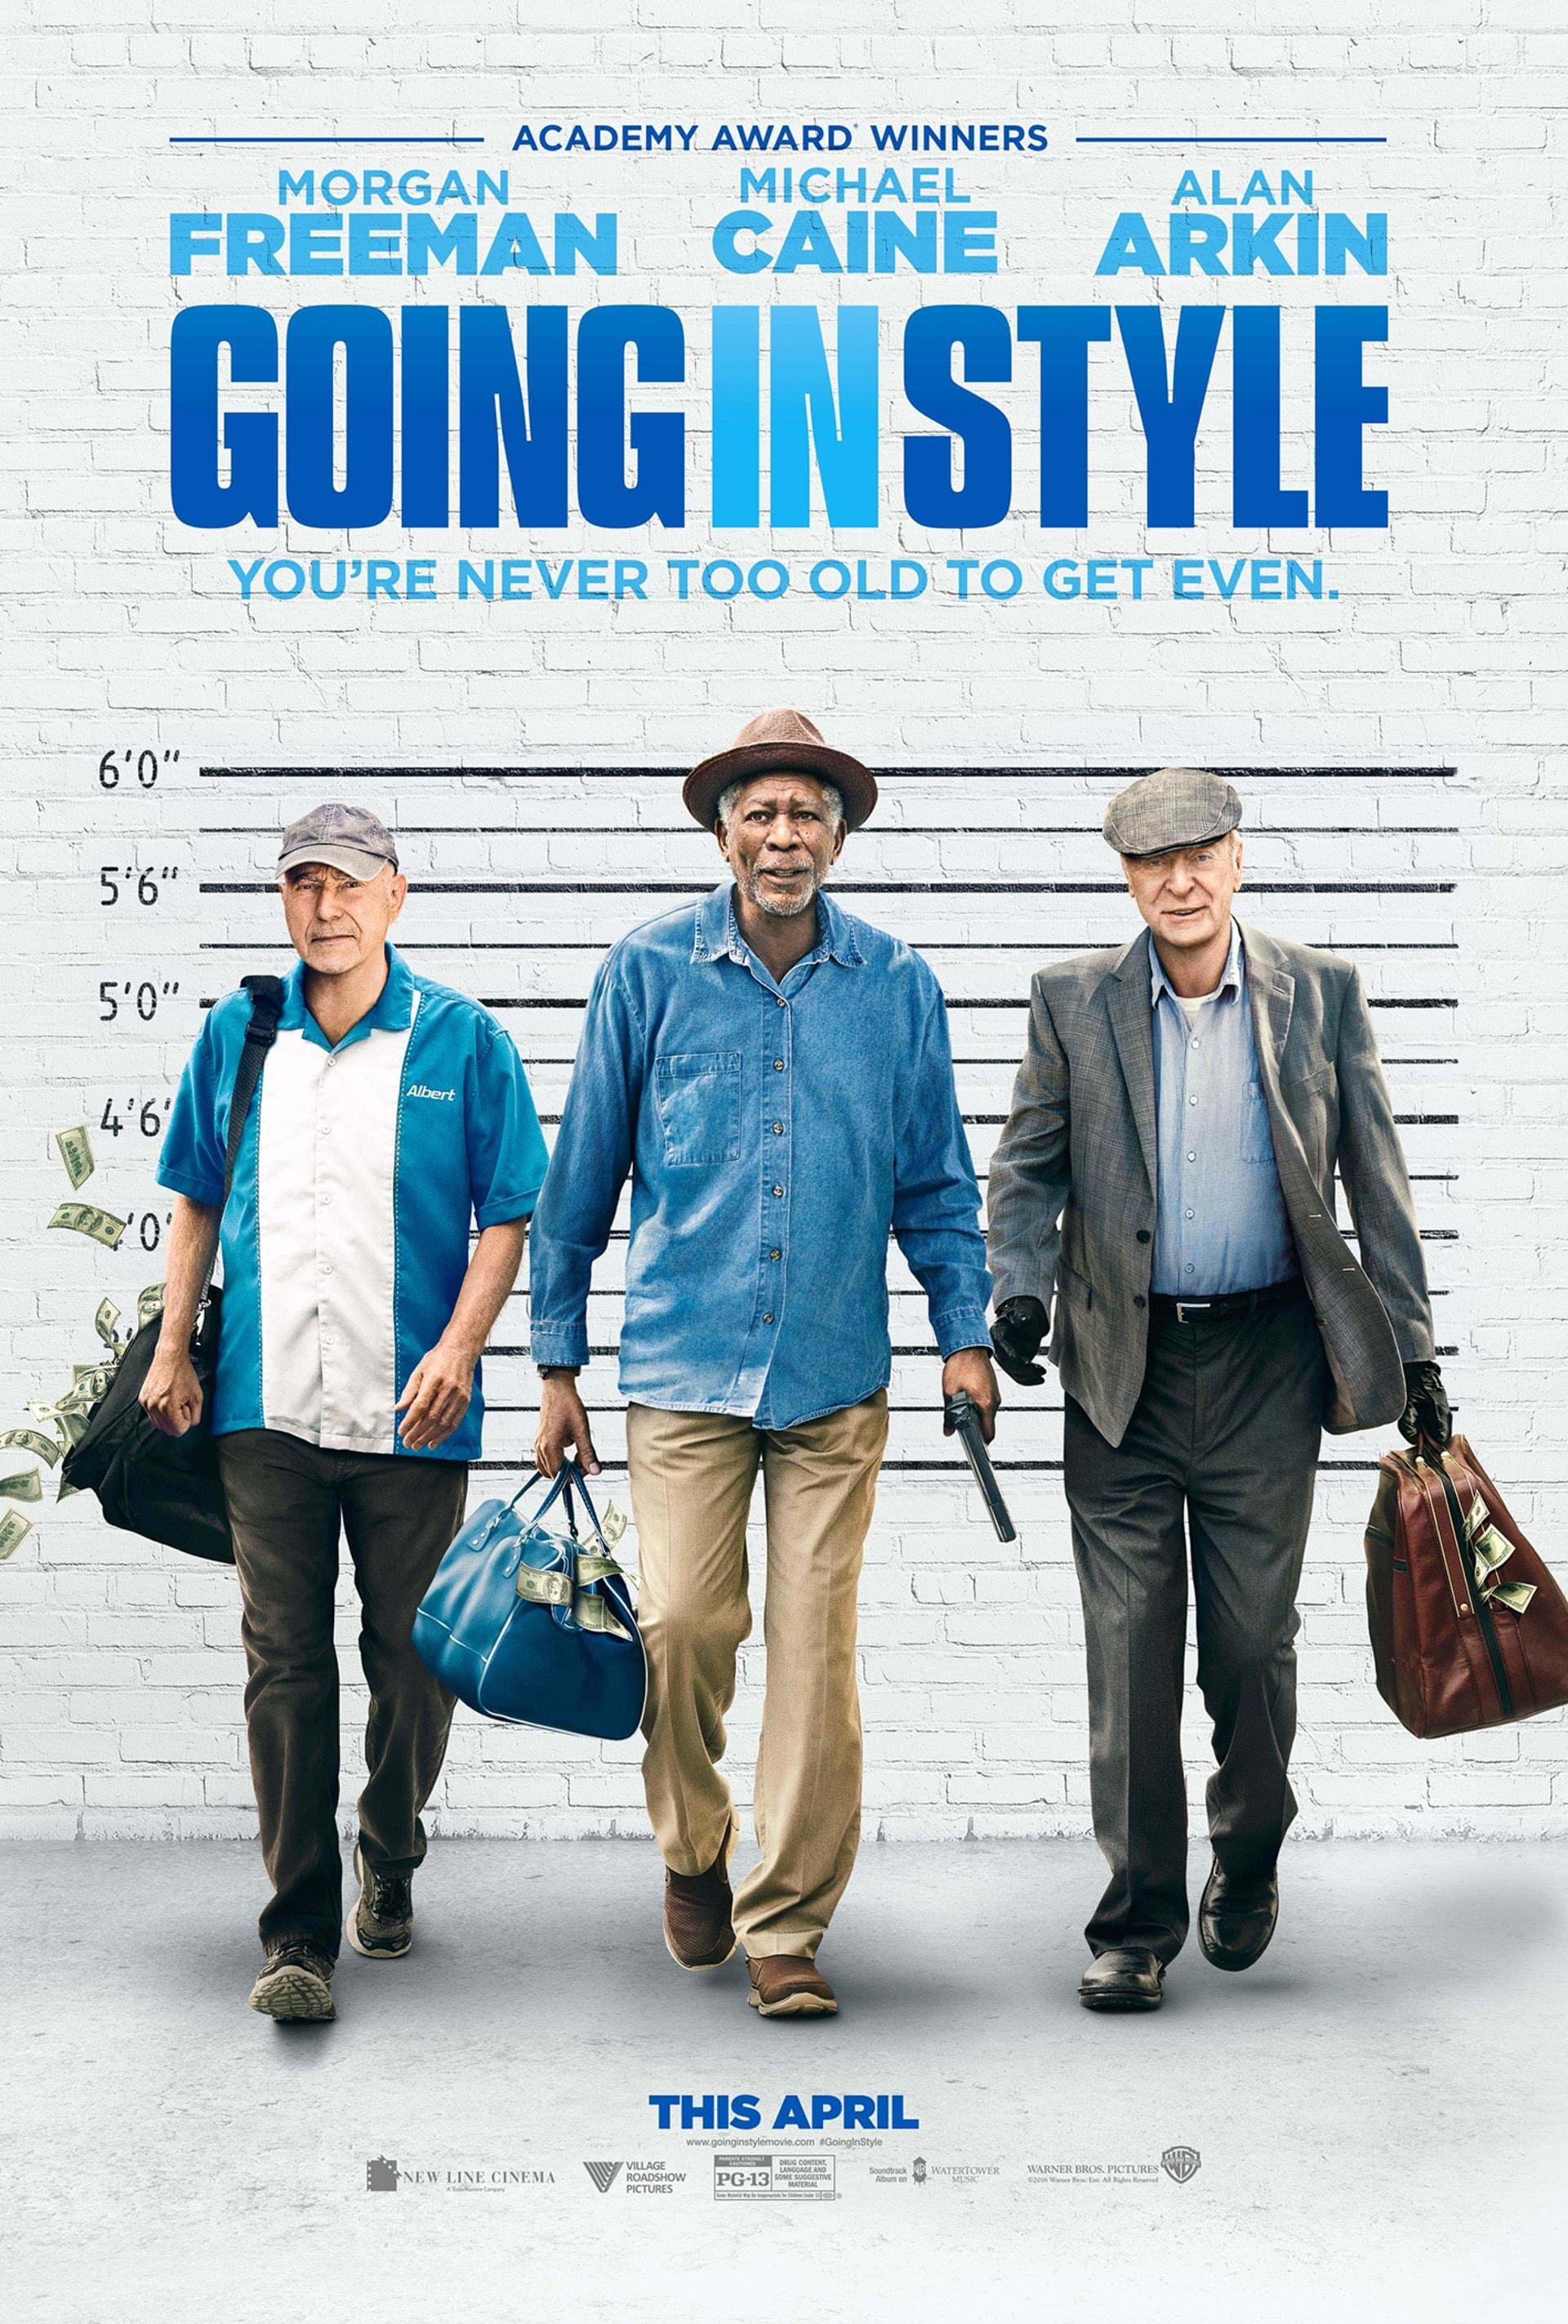 Morgan Freeman, Michael Caine and Alan Arkin